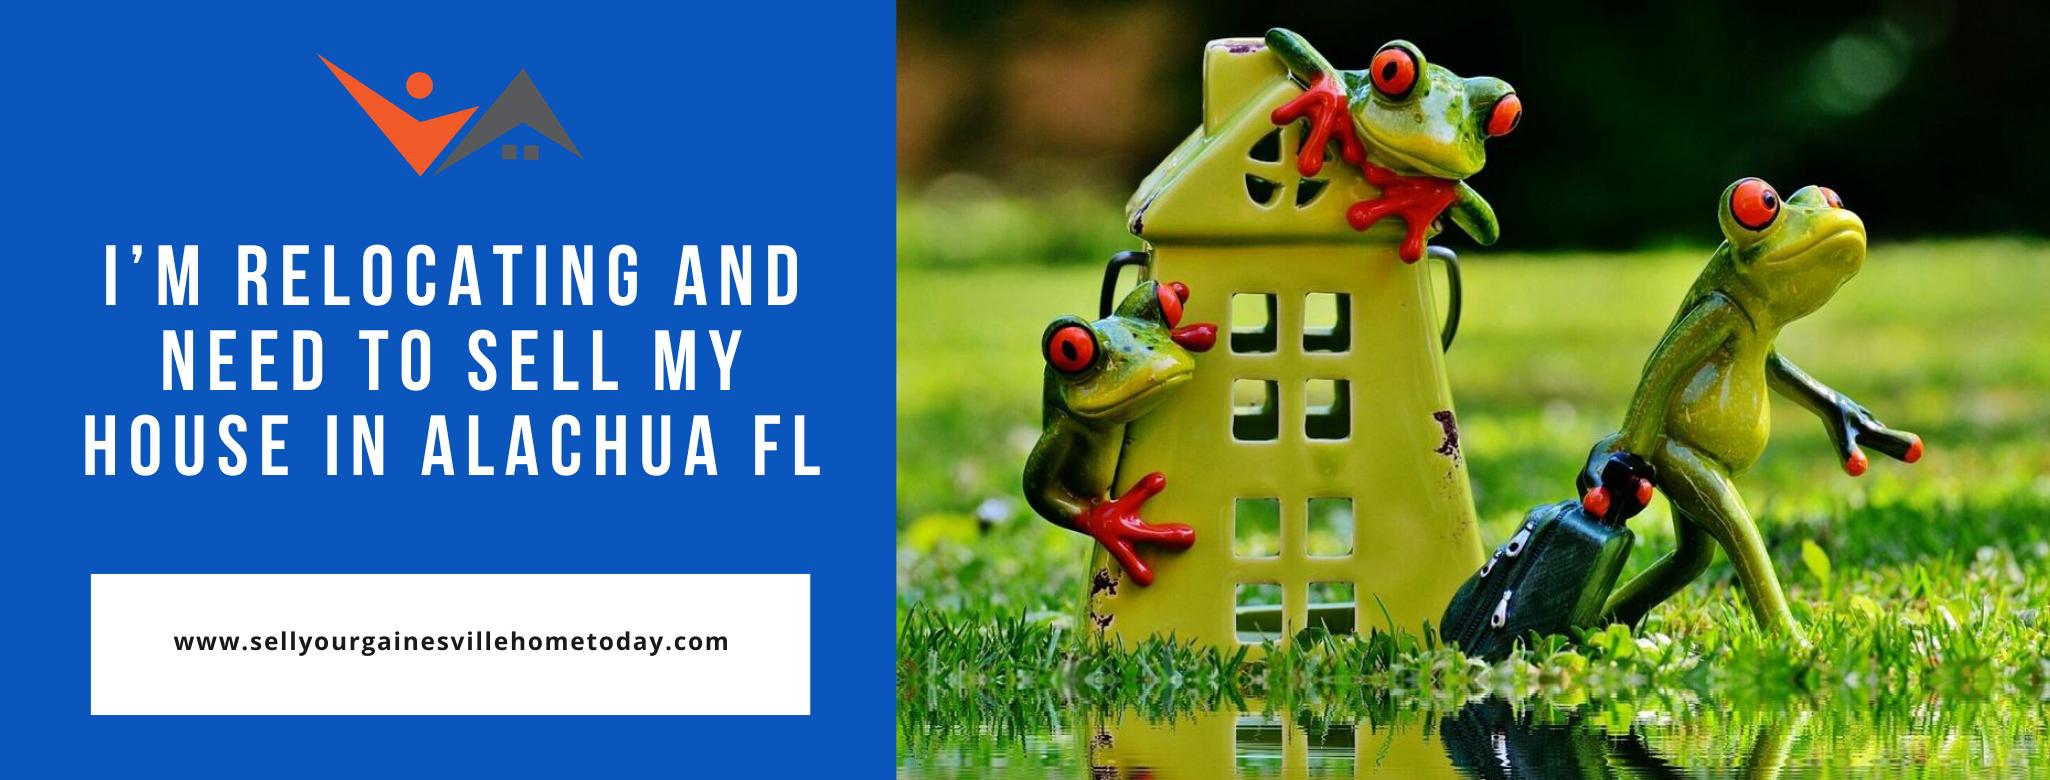 We buy properties in Alachua FL